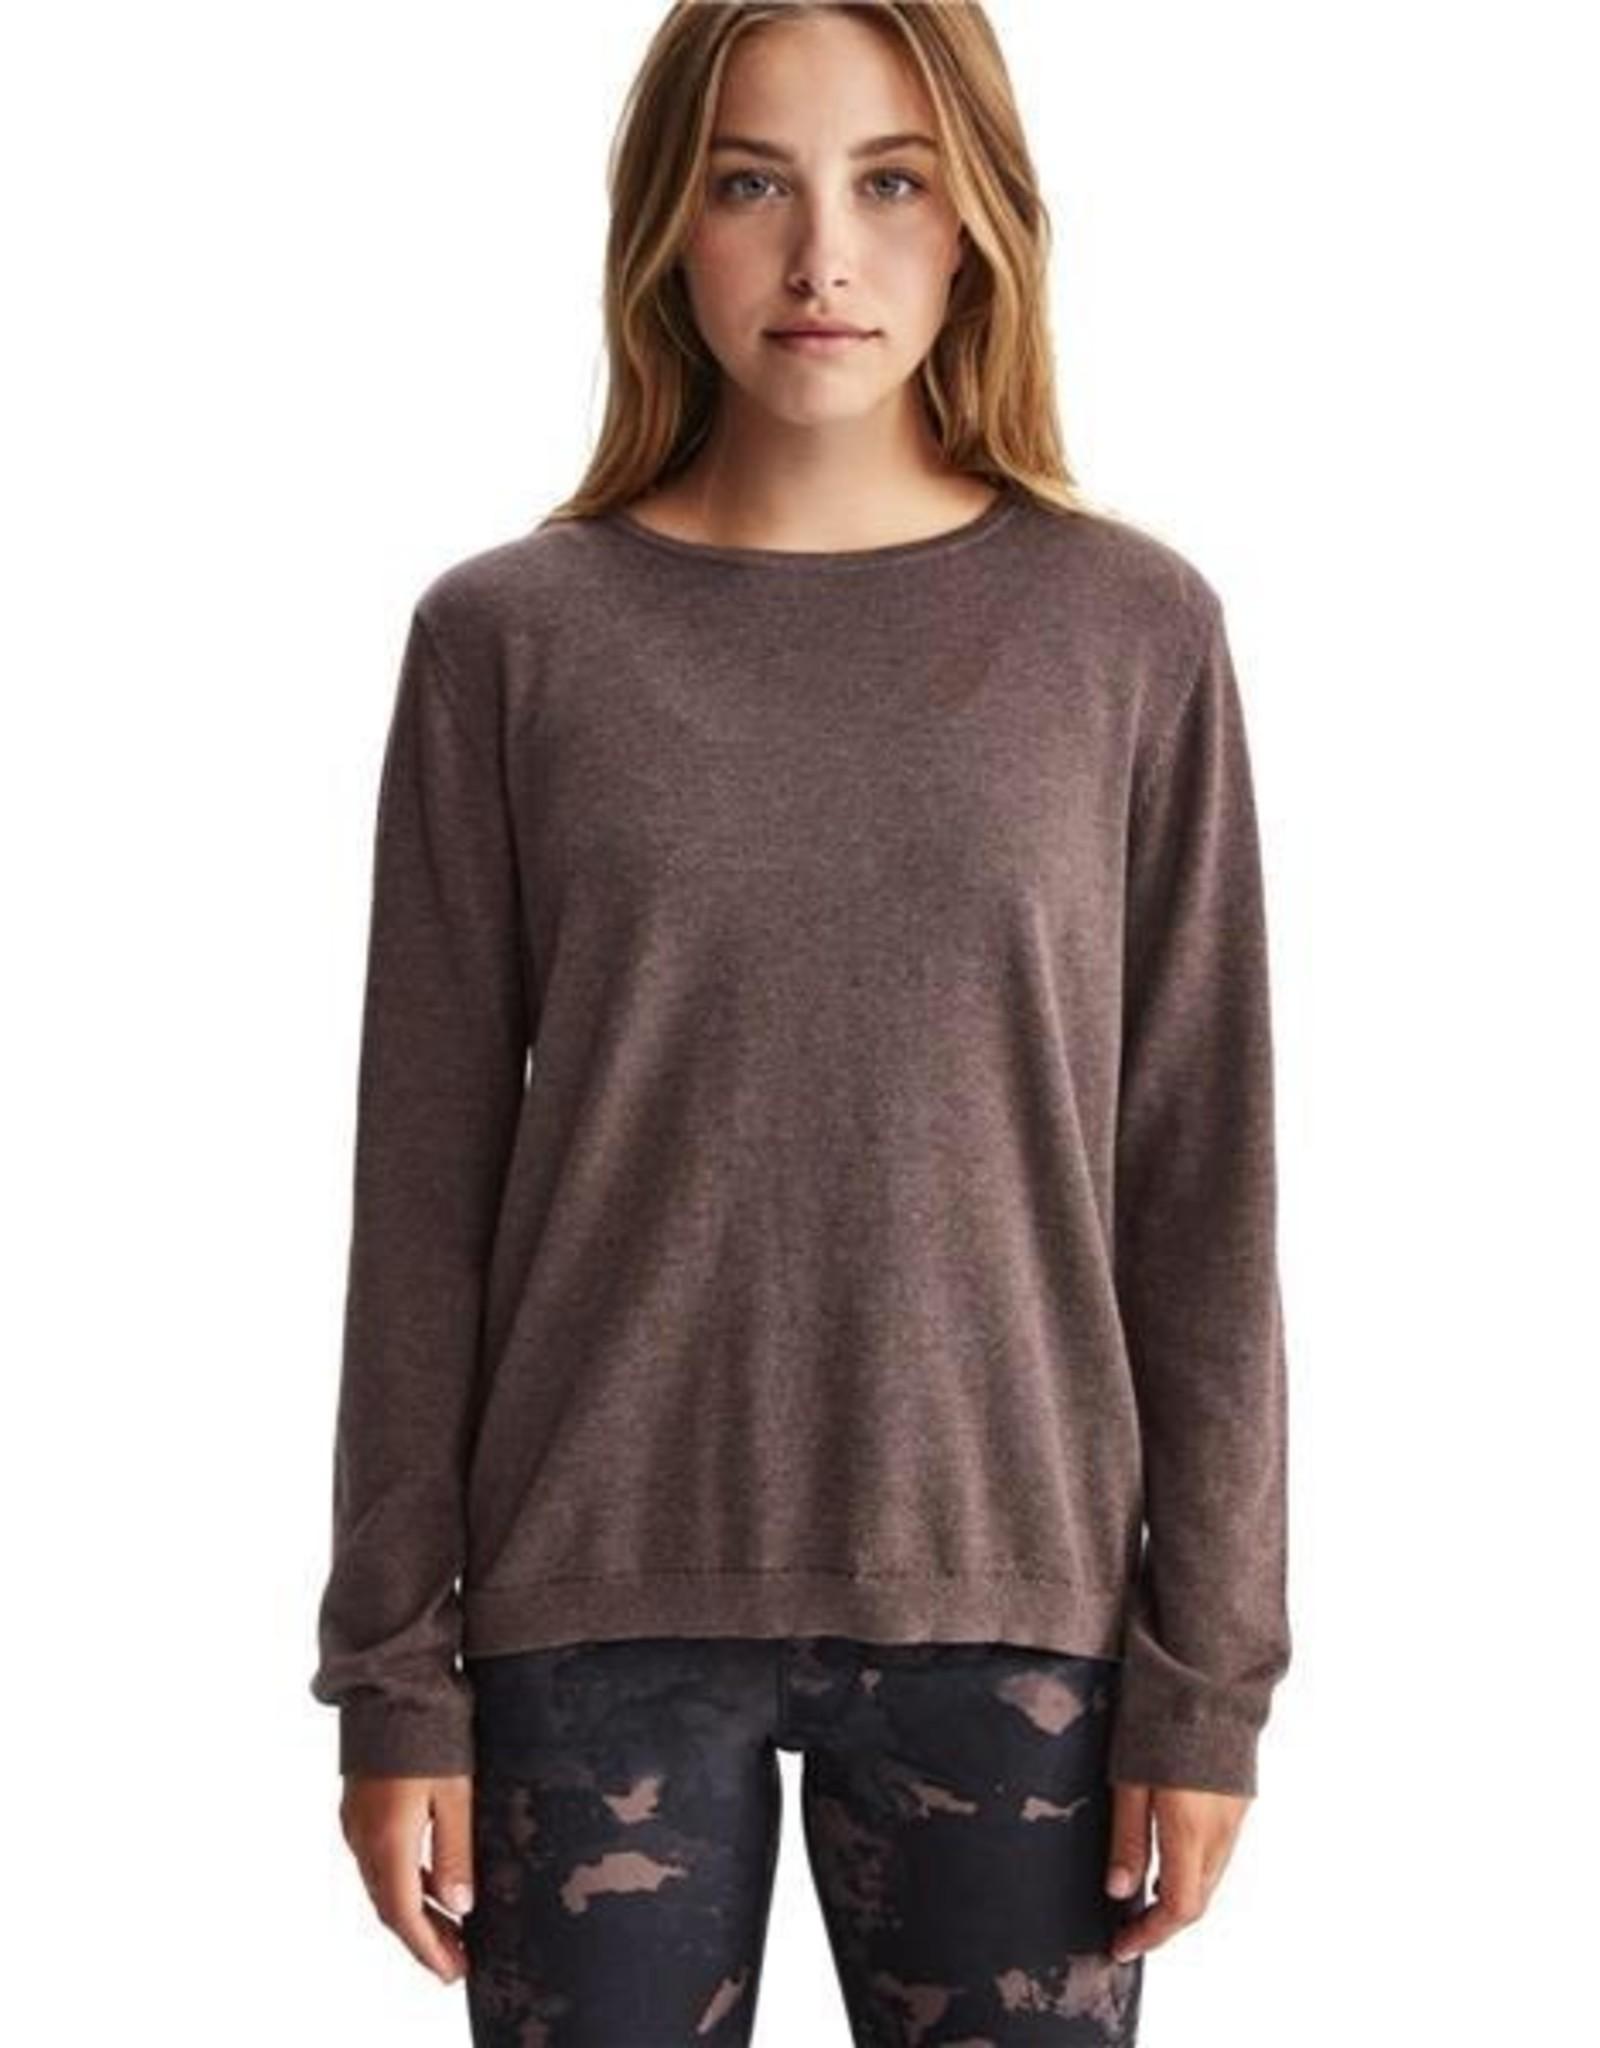 Lole Cozy crew neck sweater